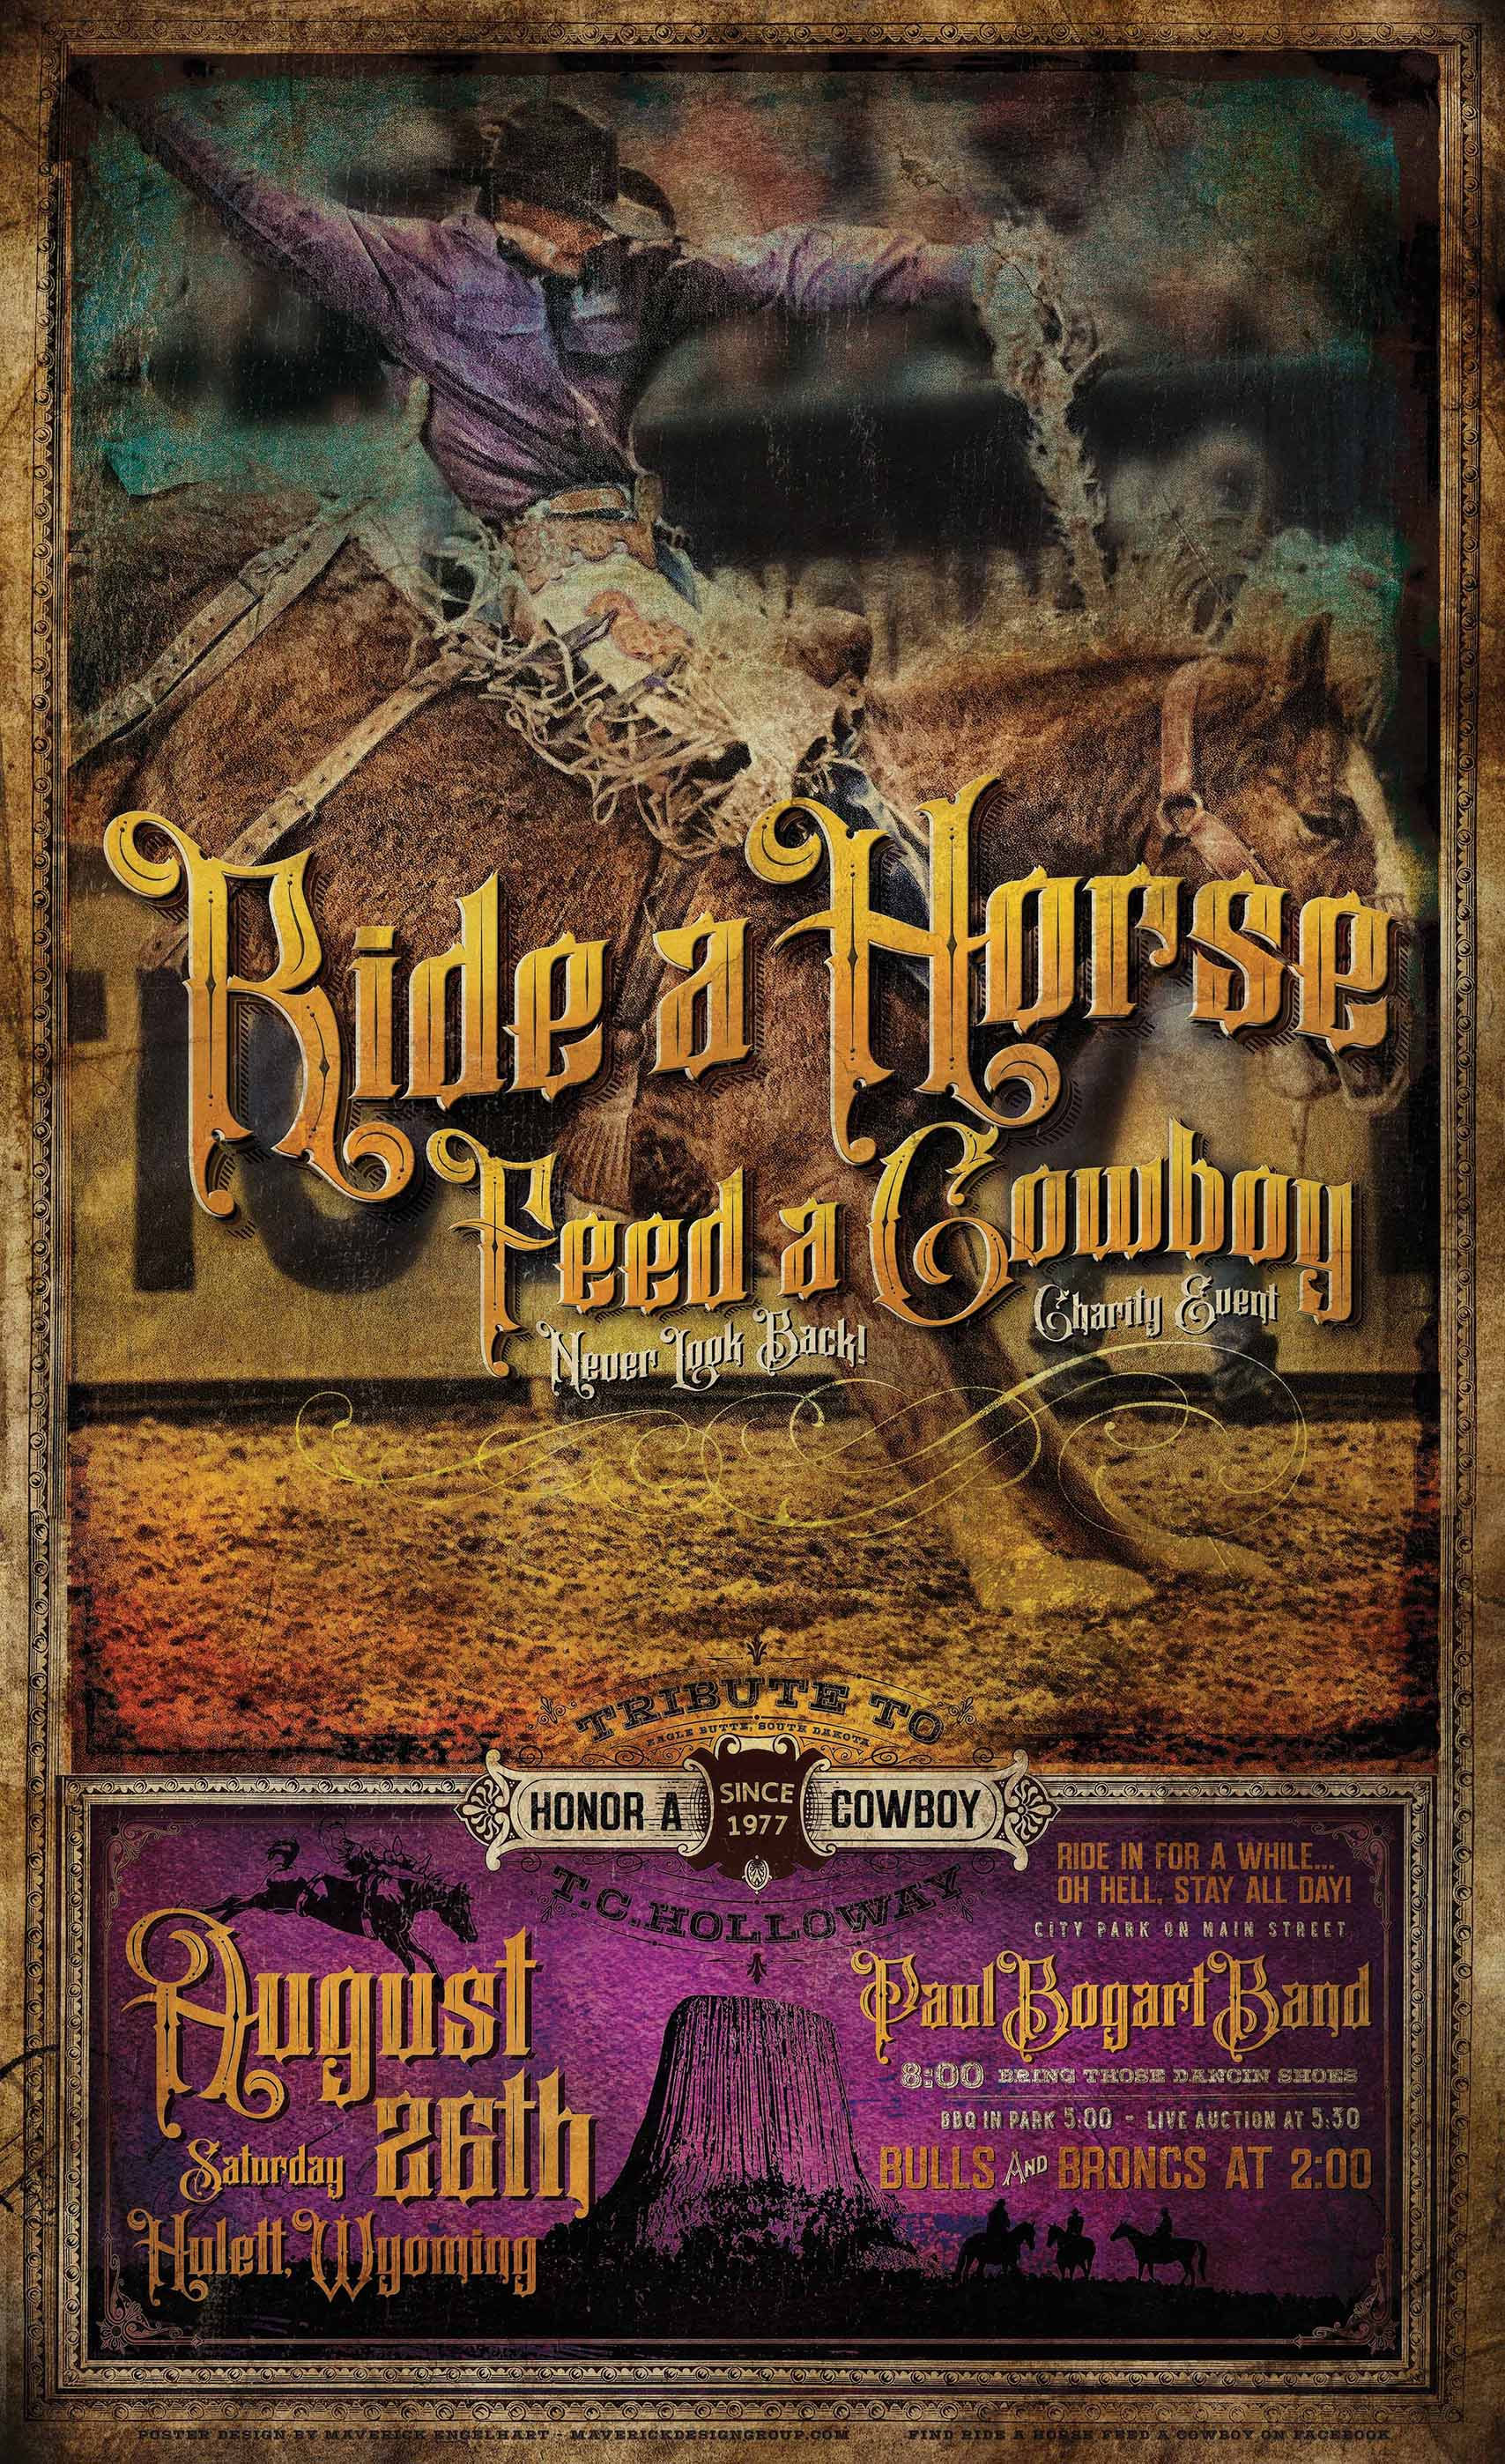 2017 Ride A Horse Feed A Cowboy Poster Design